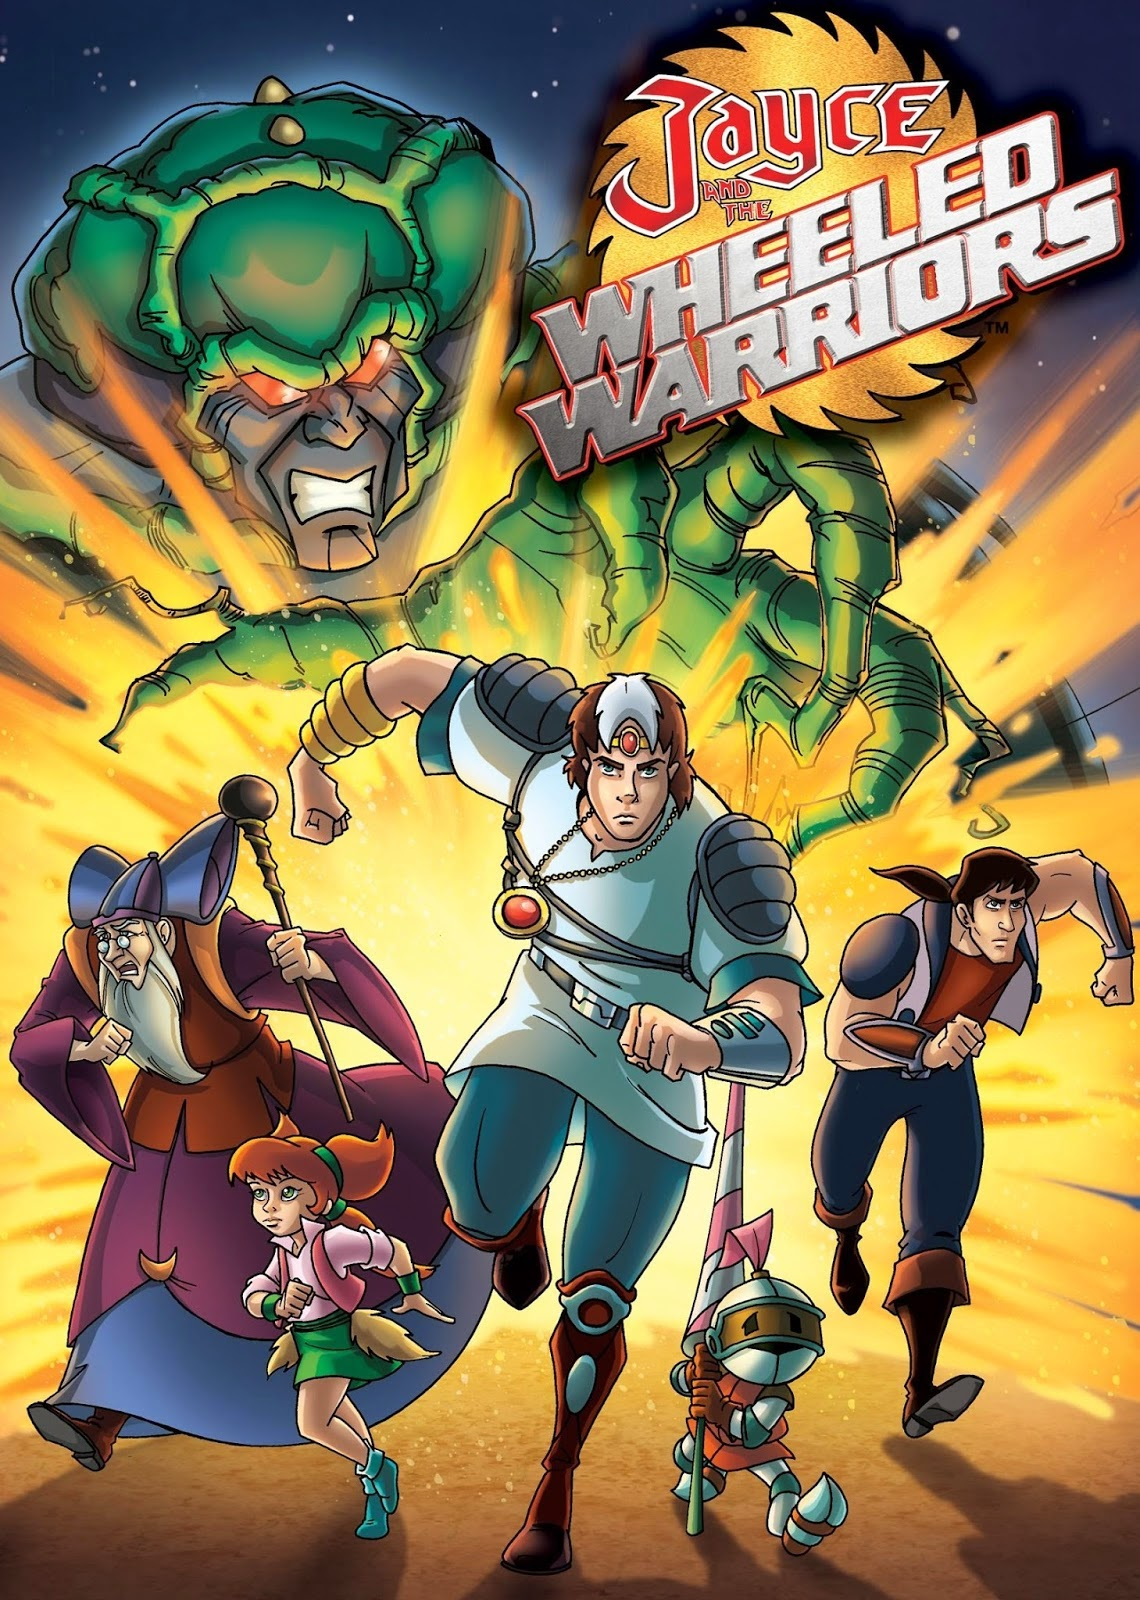 http://superheroesrevelados.blogspot.com.ar/2014/05/jayce-and-wheeled-warriors.html